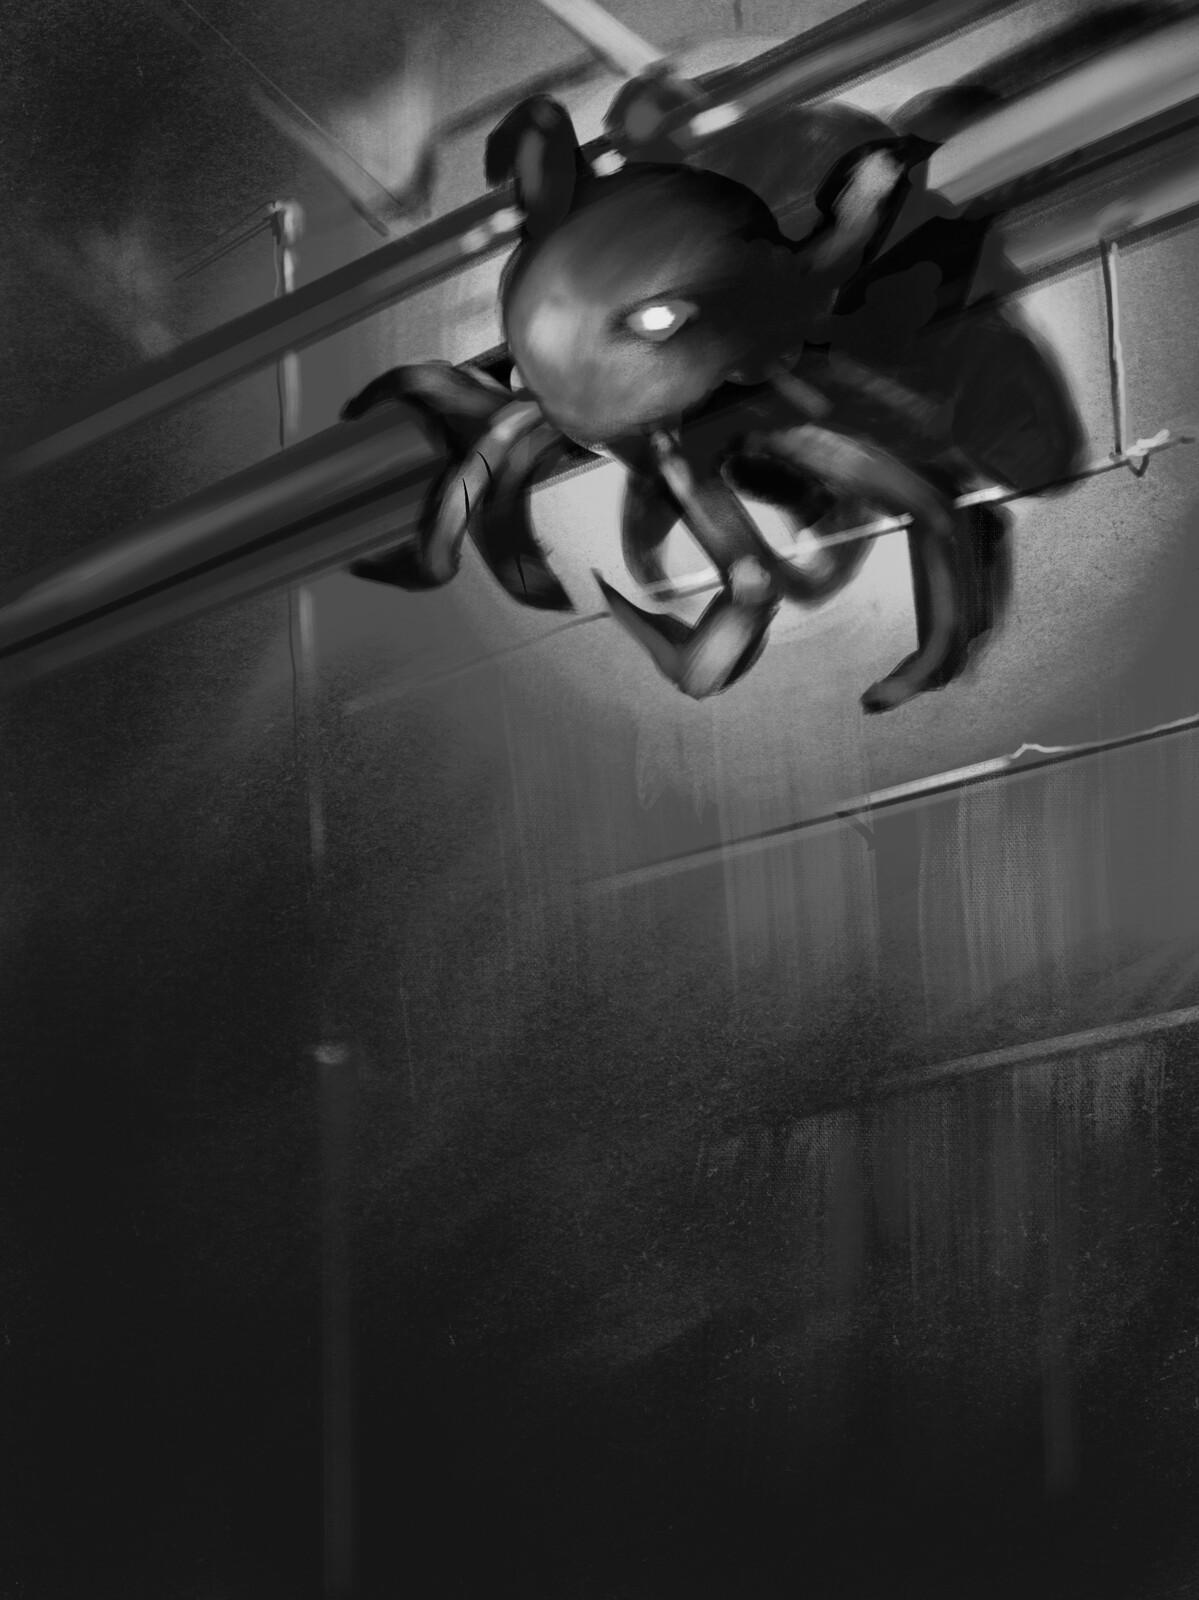 Nice. I found this creepy little bastard in my nightmare basement.